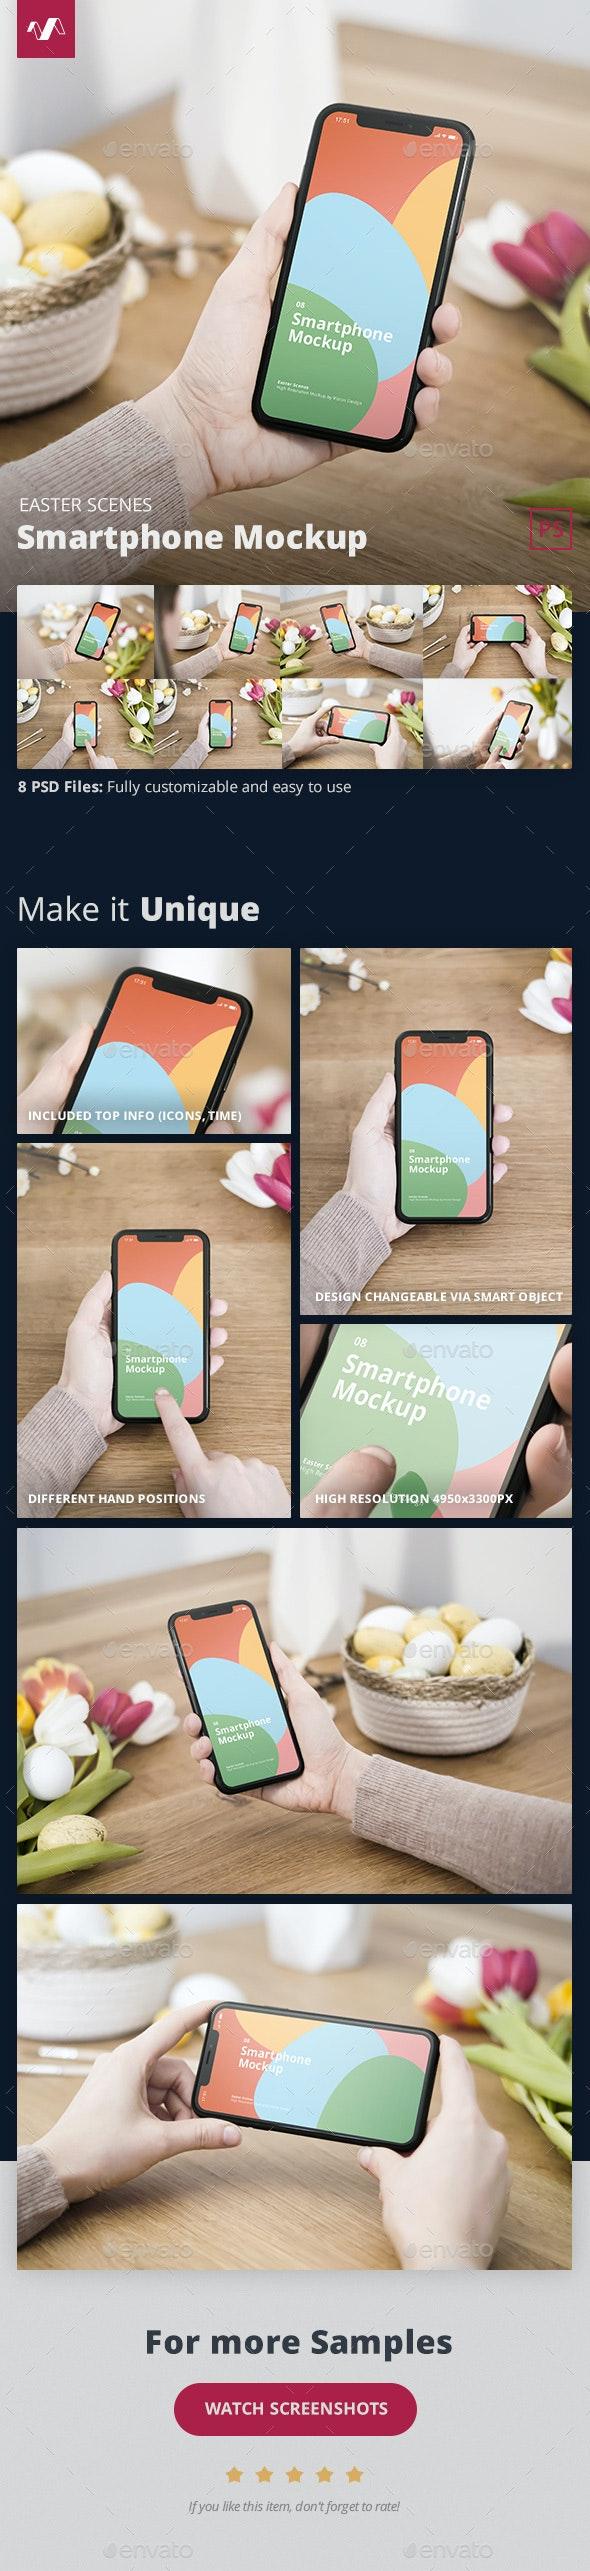 Easter Phone Mockup - Mobile Displays